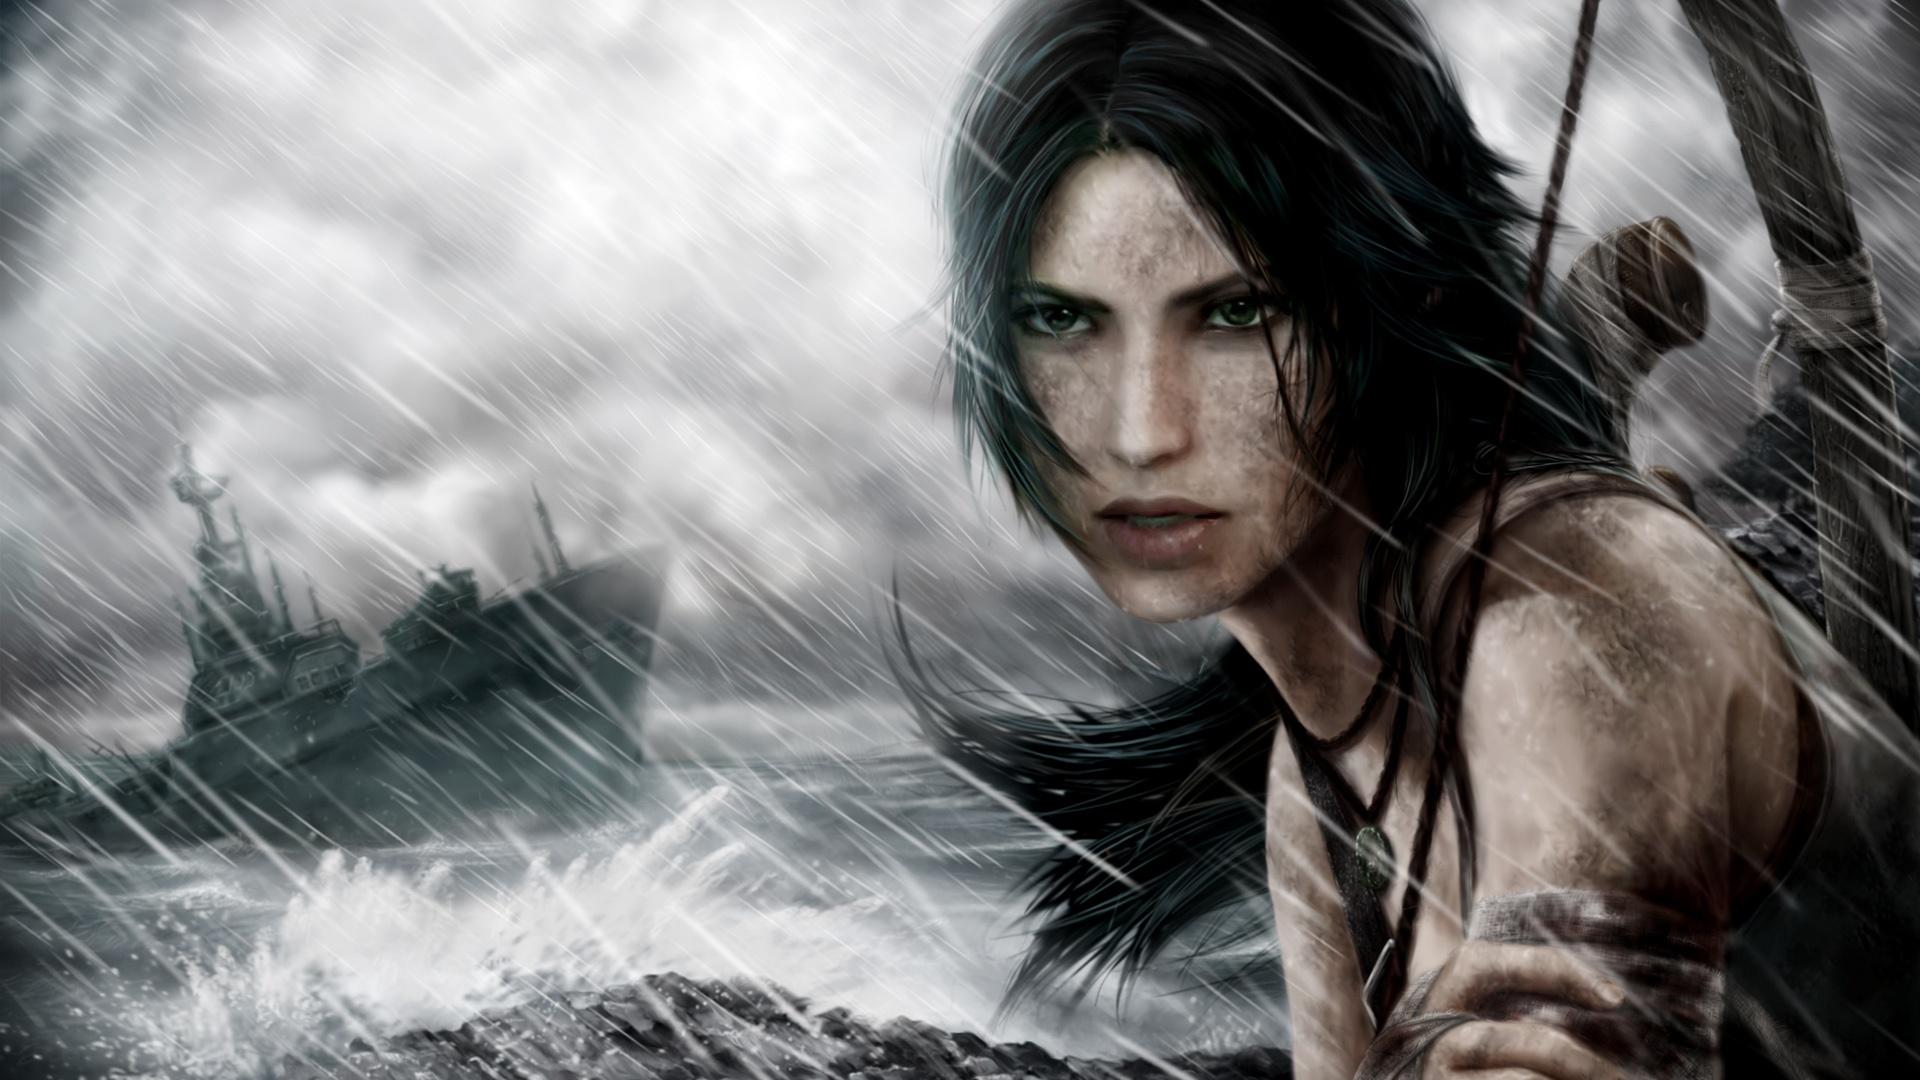 Tomb Raider Wallpapers 32266 1920x1080 Px Hdwallsource Com